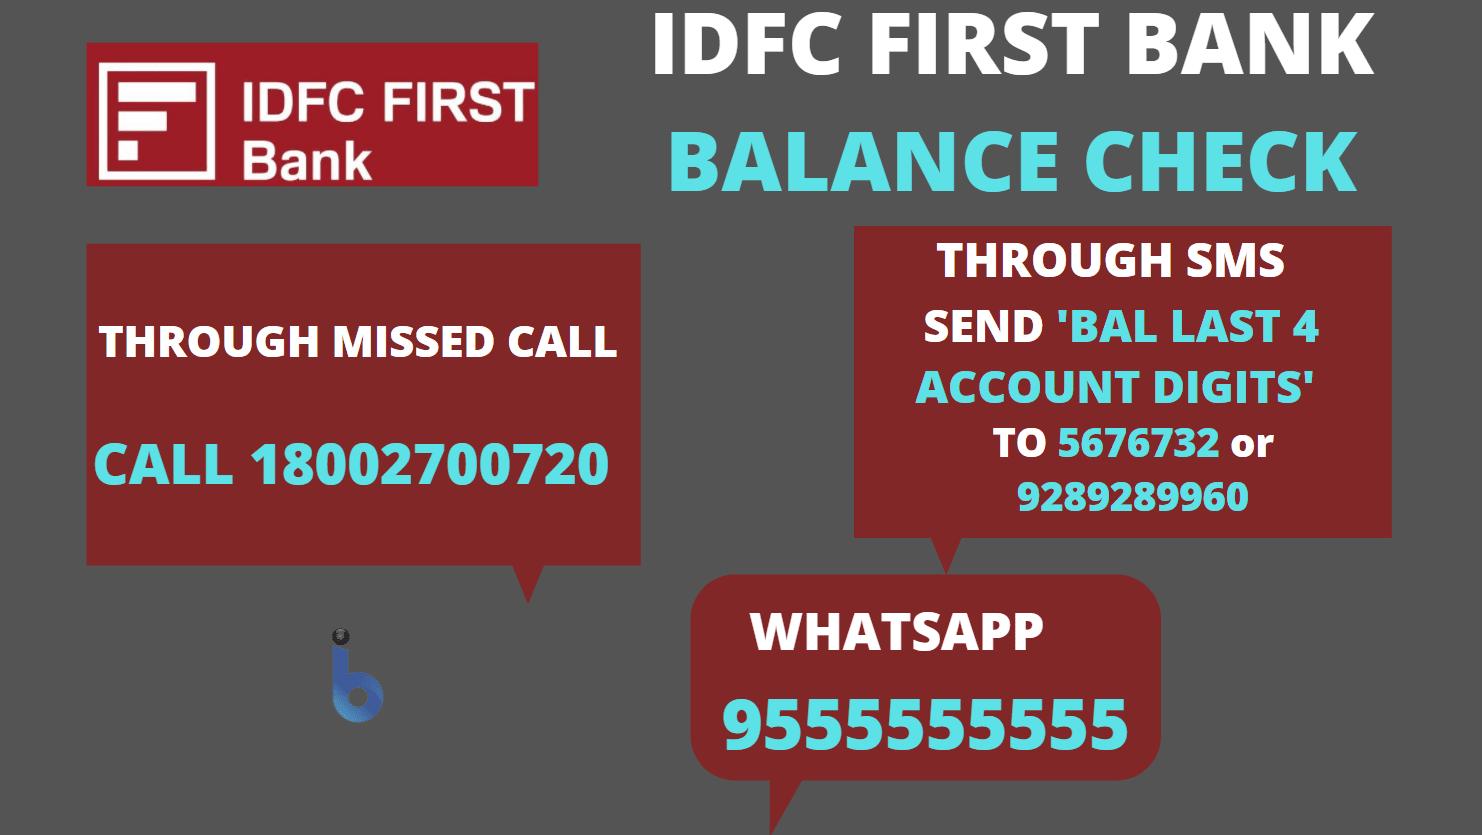 IDFC FIRST Bank Account Balance Check